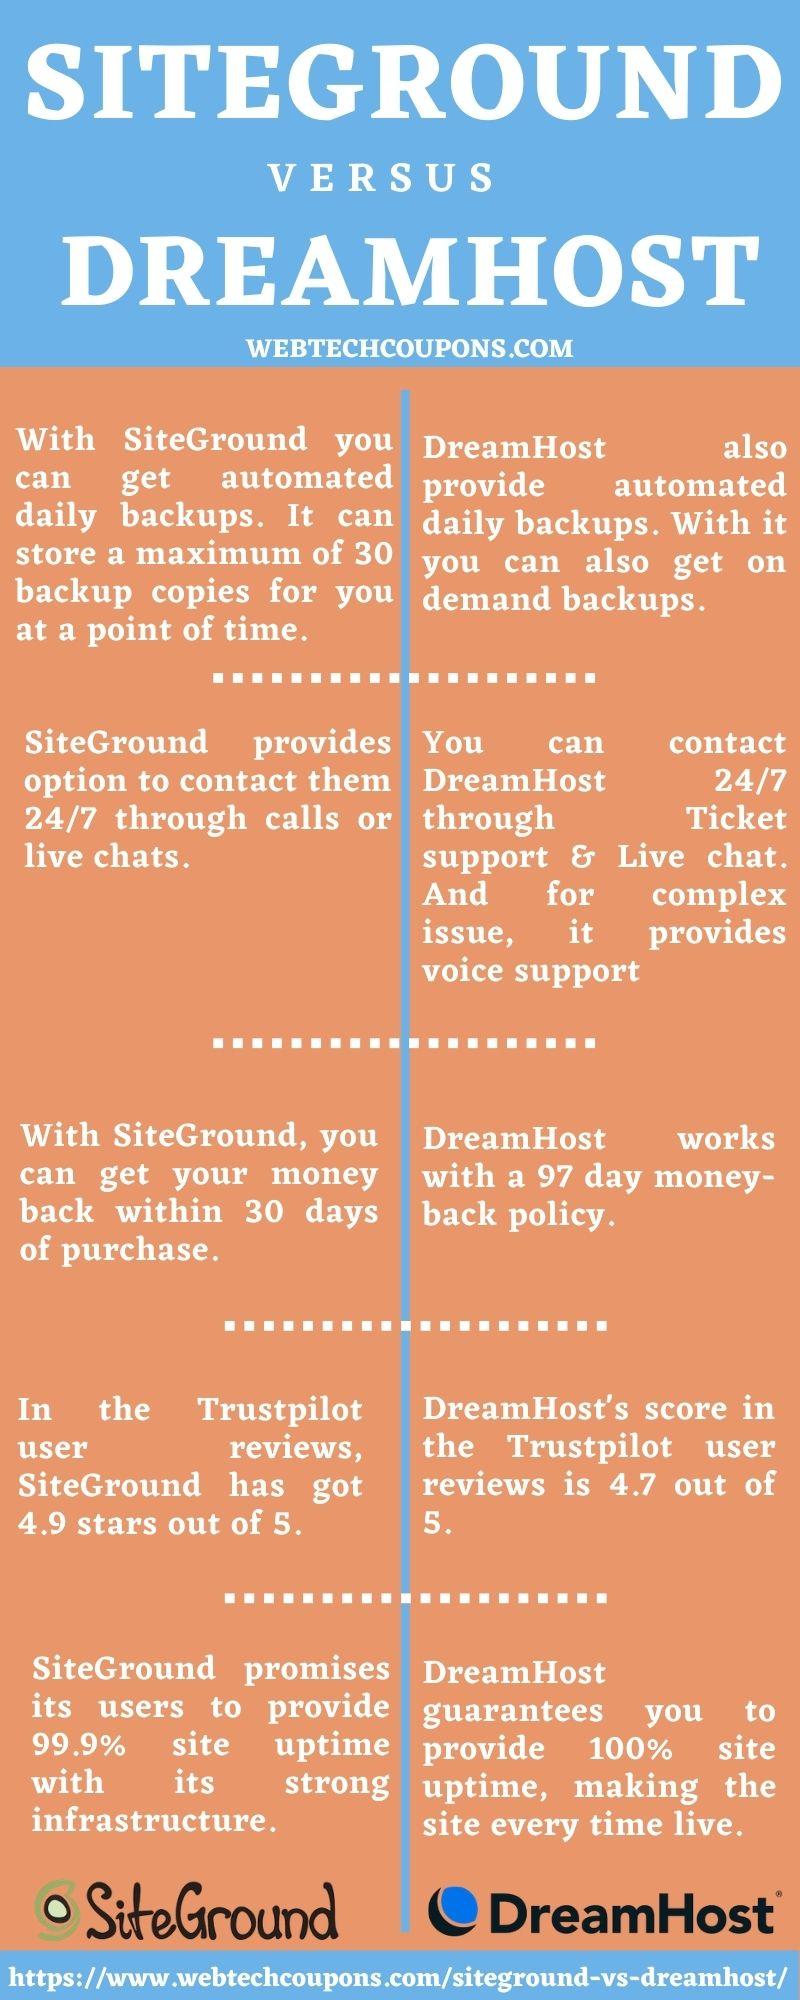 Comparison of SiteGround & DreamHost